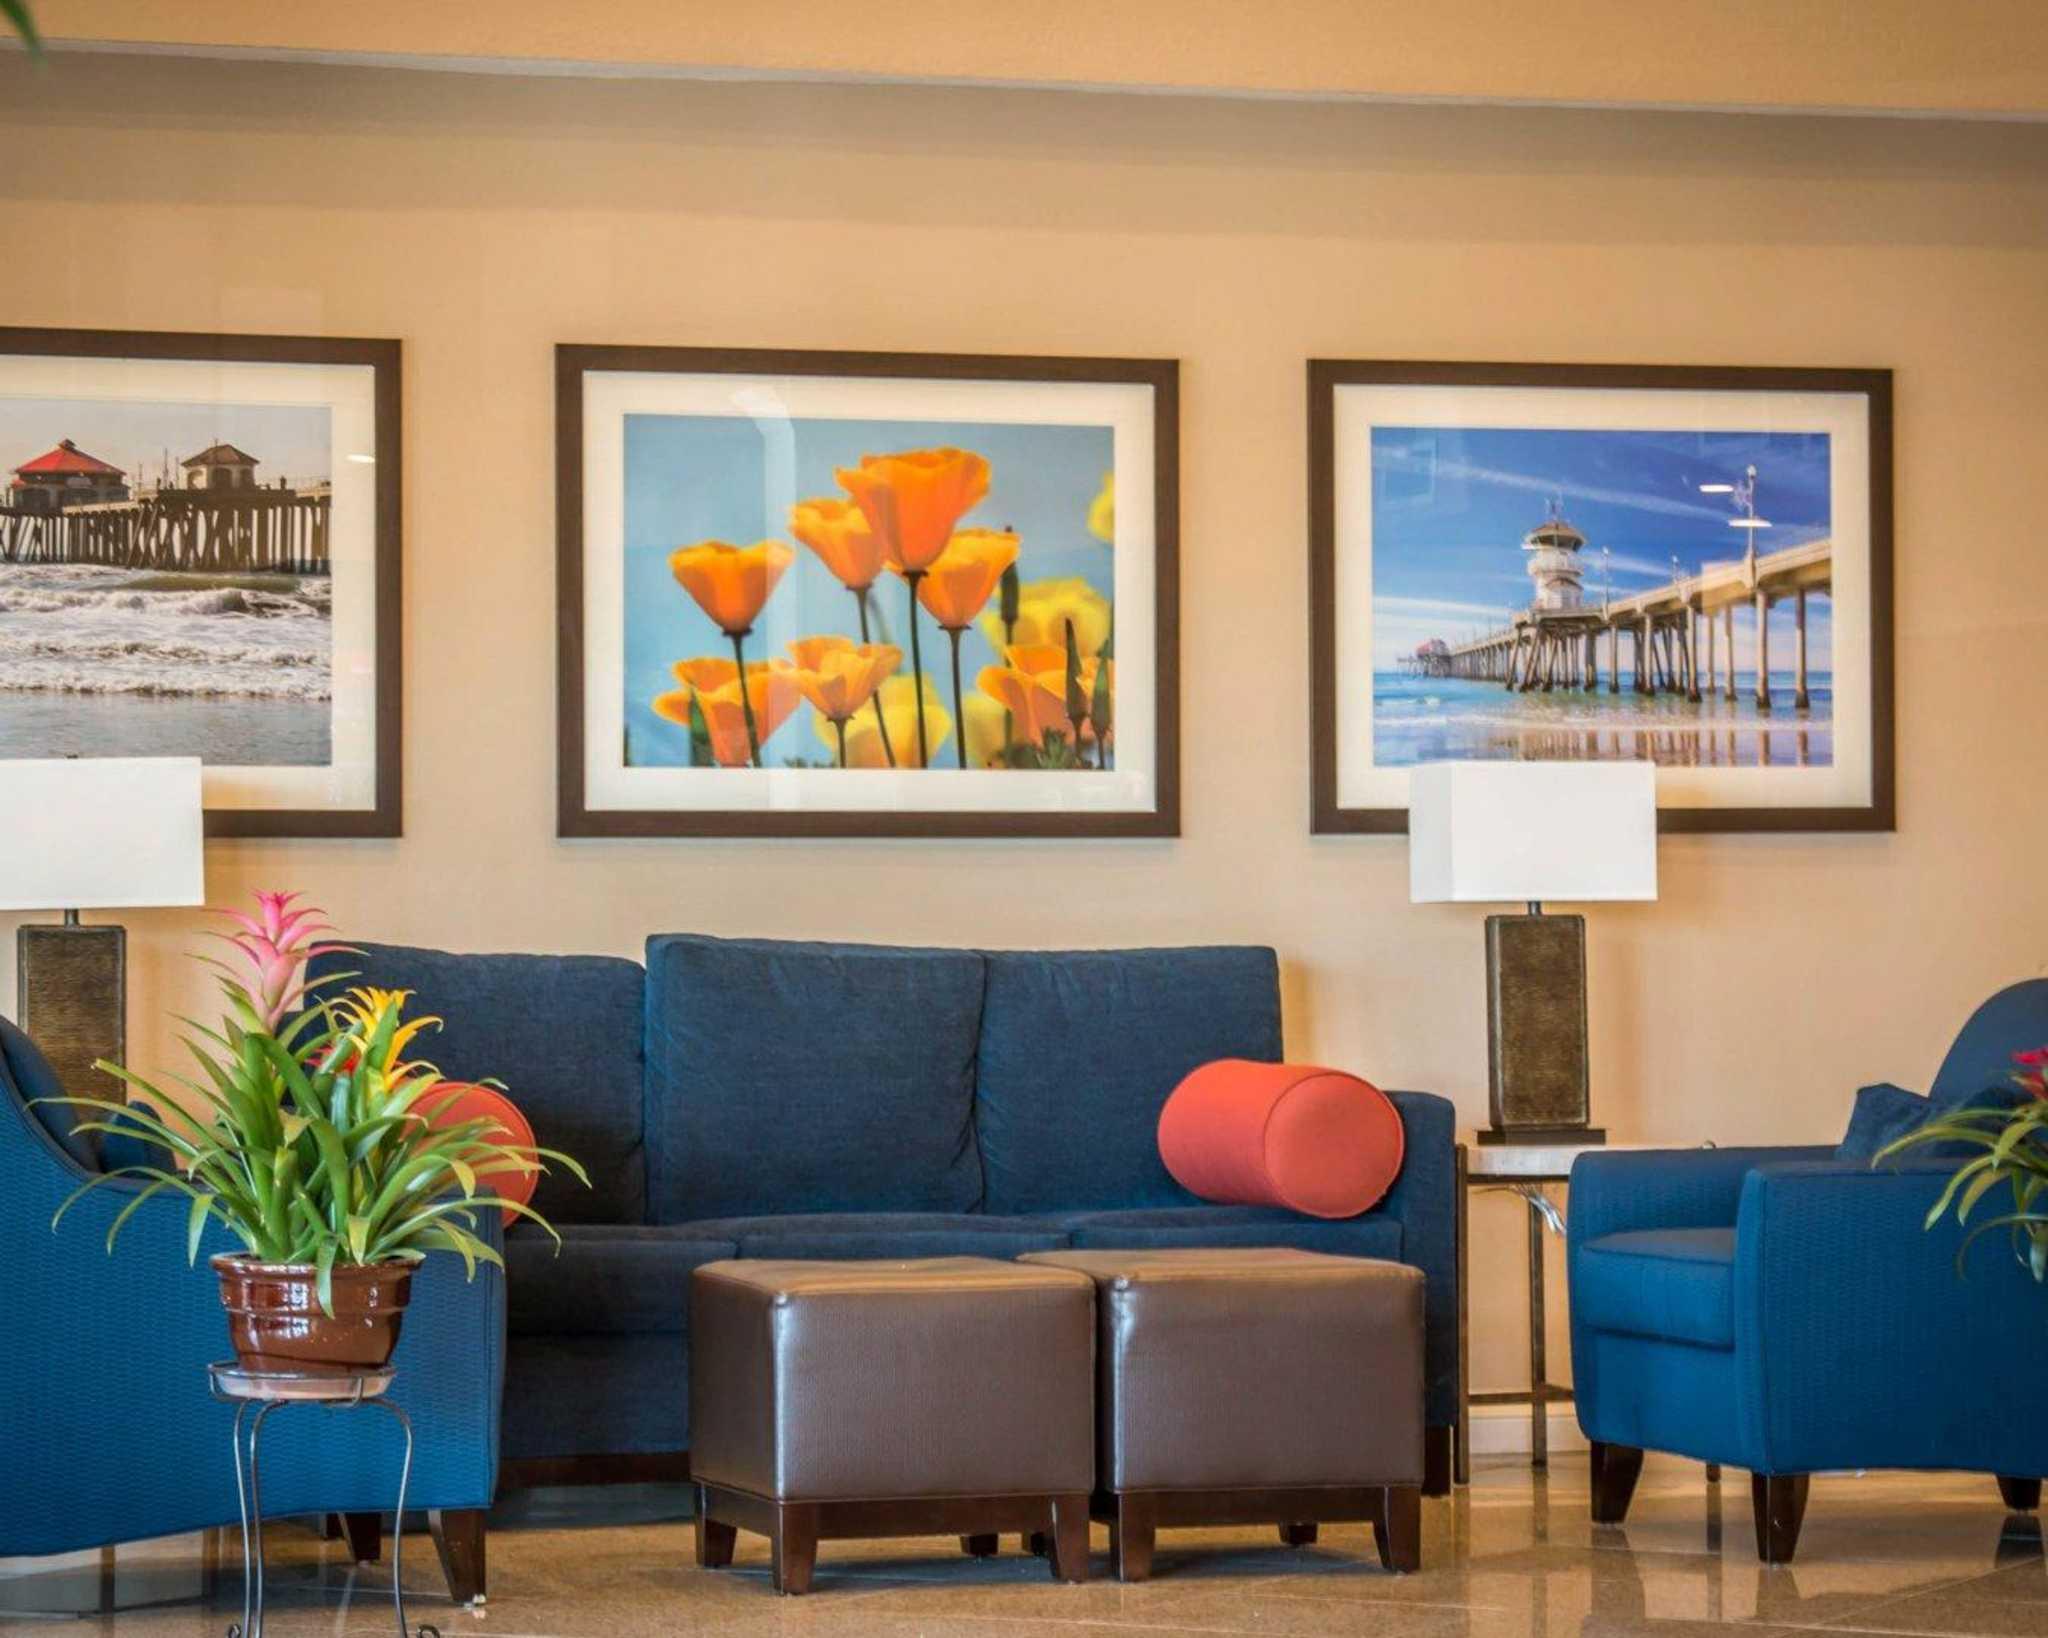 Comfort Suites Huntington Beach image 13